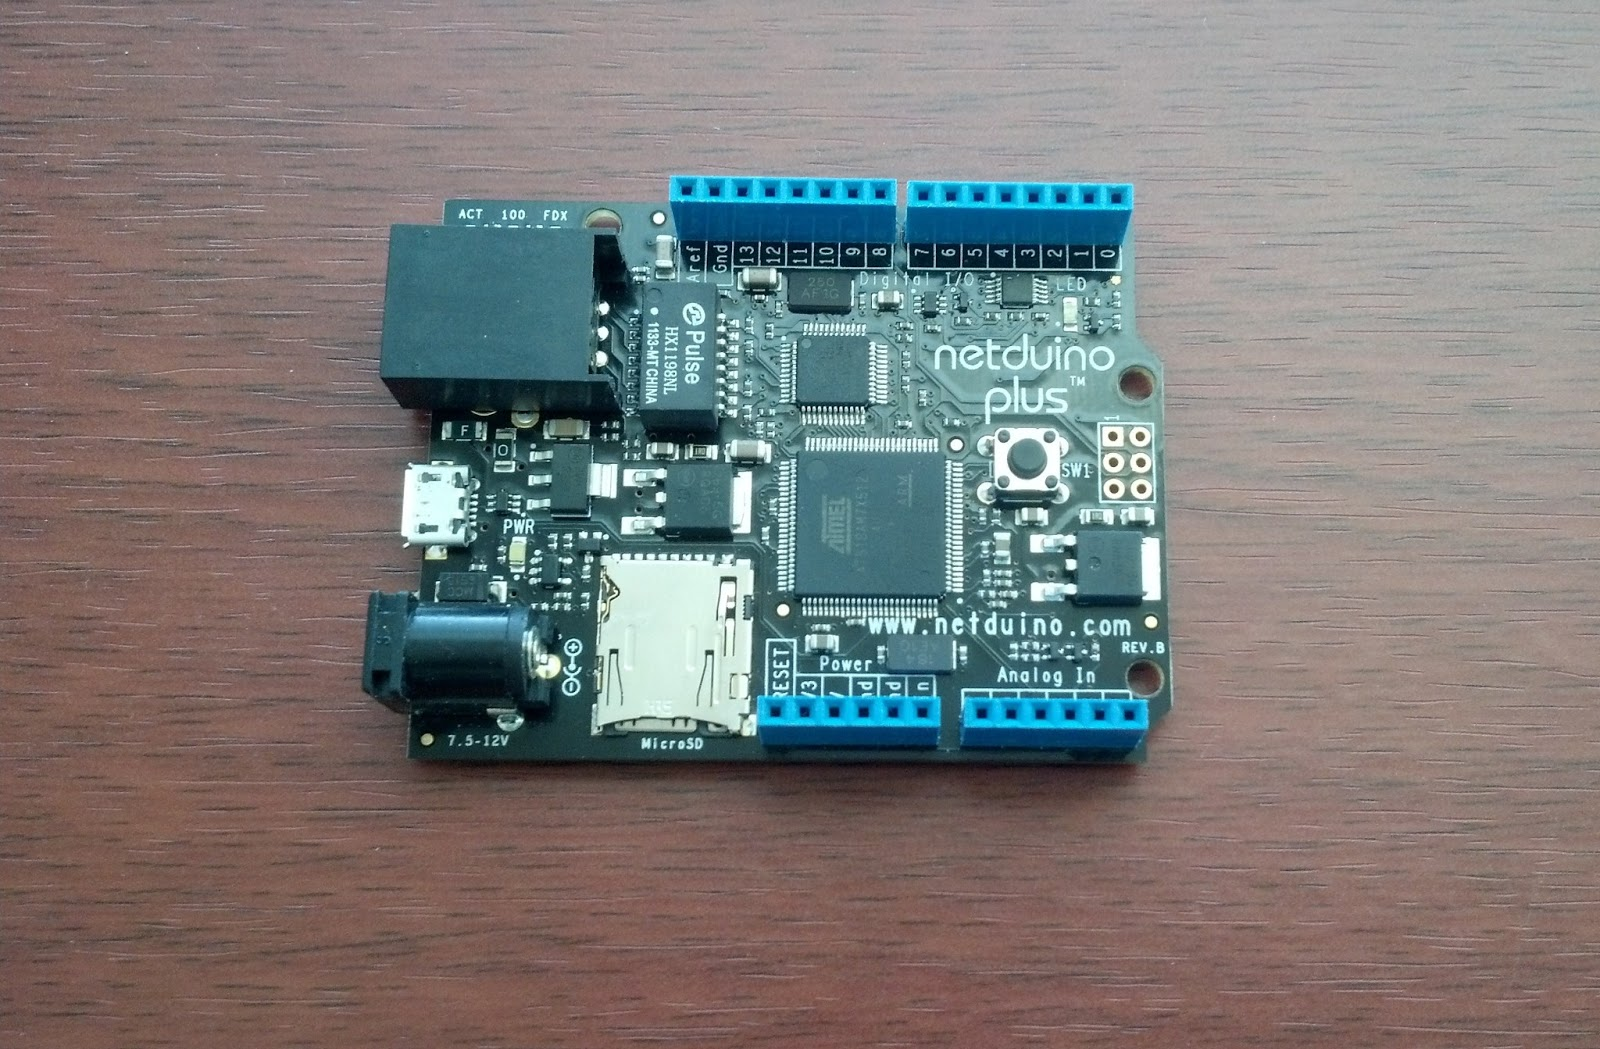 Homealarmplus Pi Home Alarm System Wiring Diagram View Security Netduino Plus 1